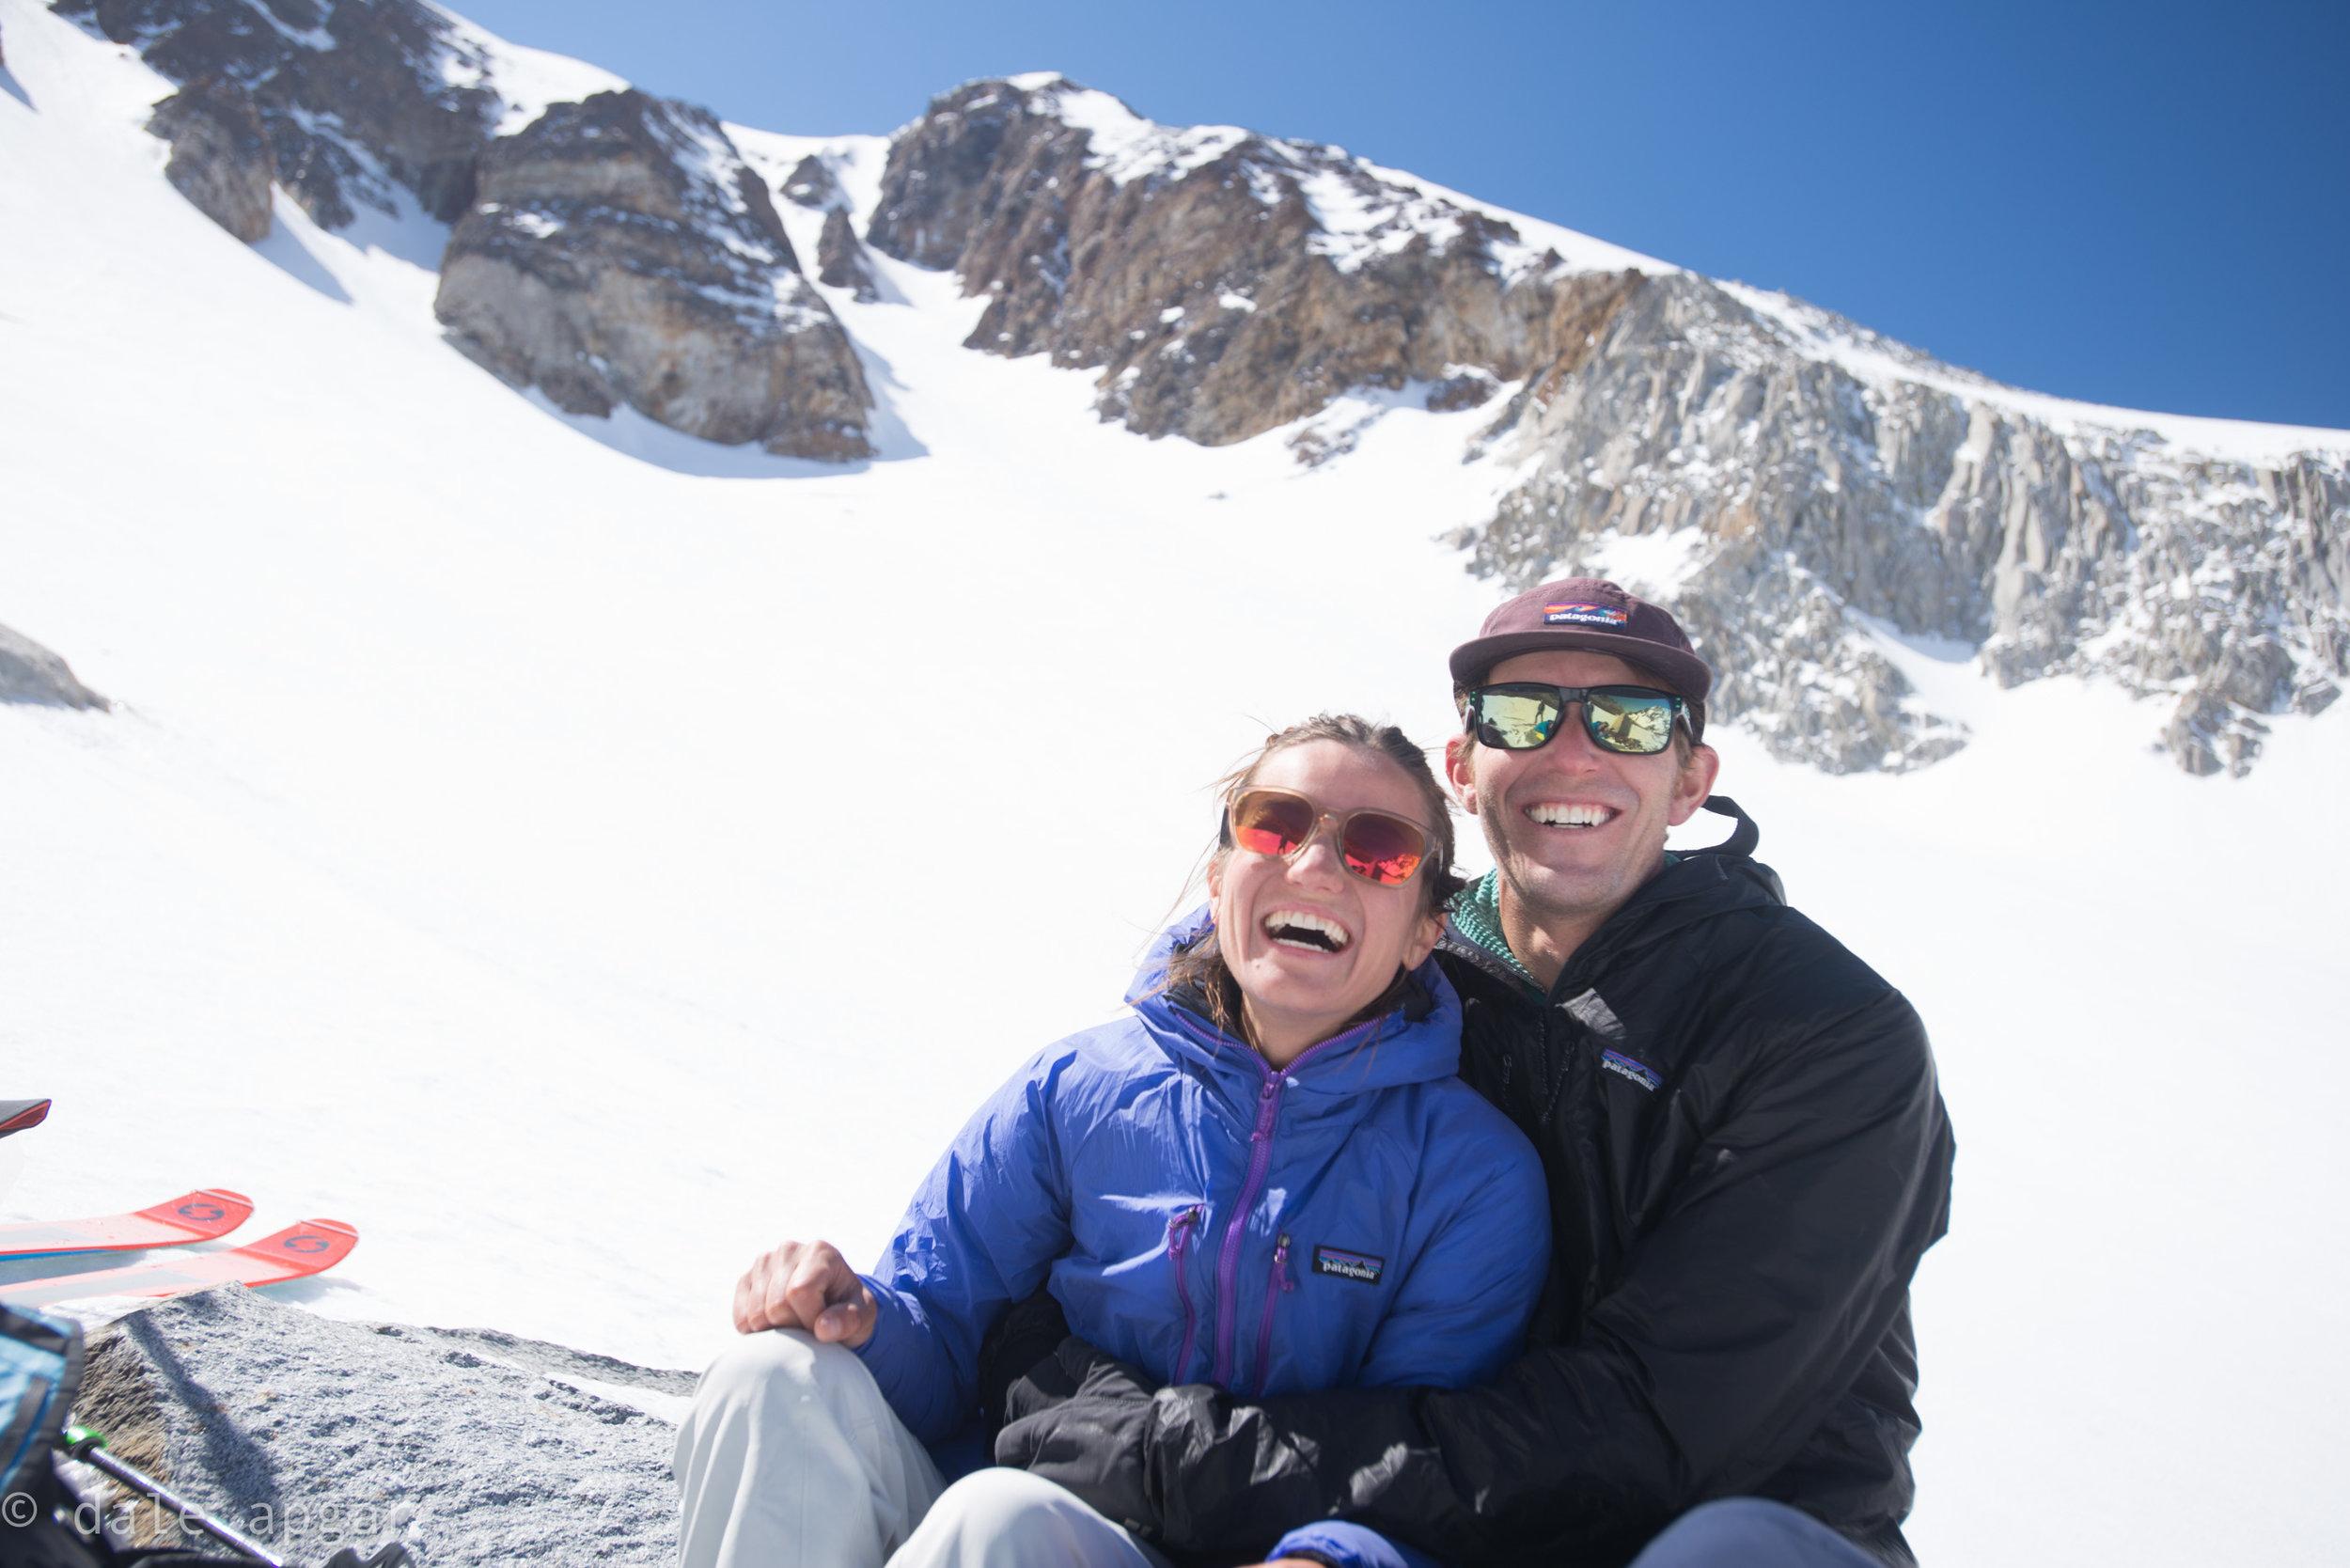 Romara and Linden taking a fun snack break low on Bloody Mountain.